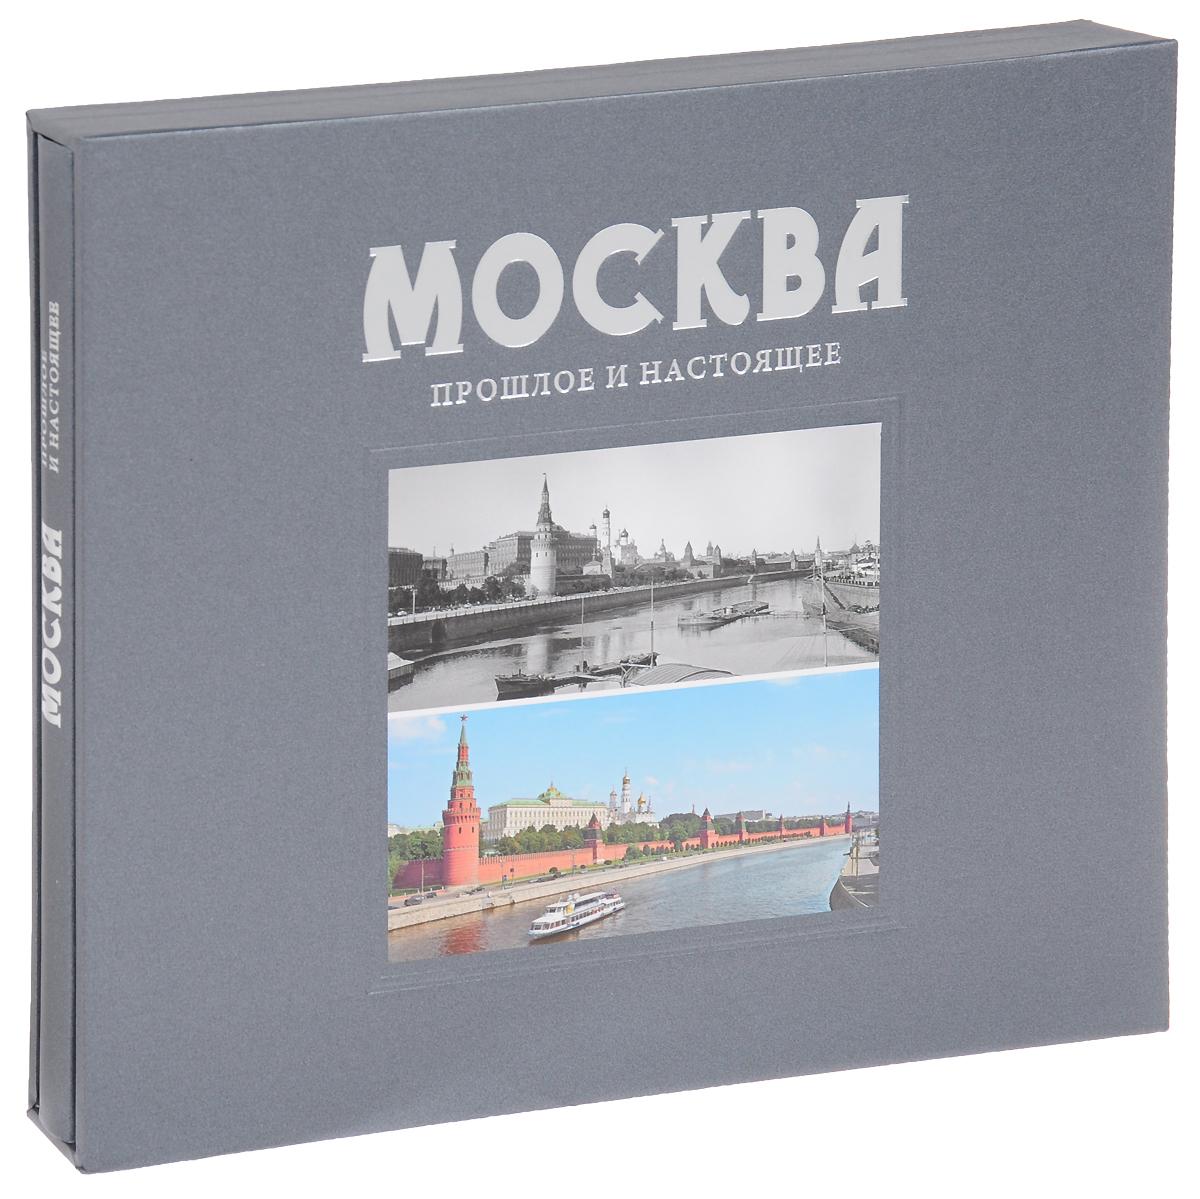 Альбом москва картинки